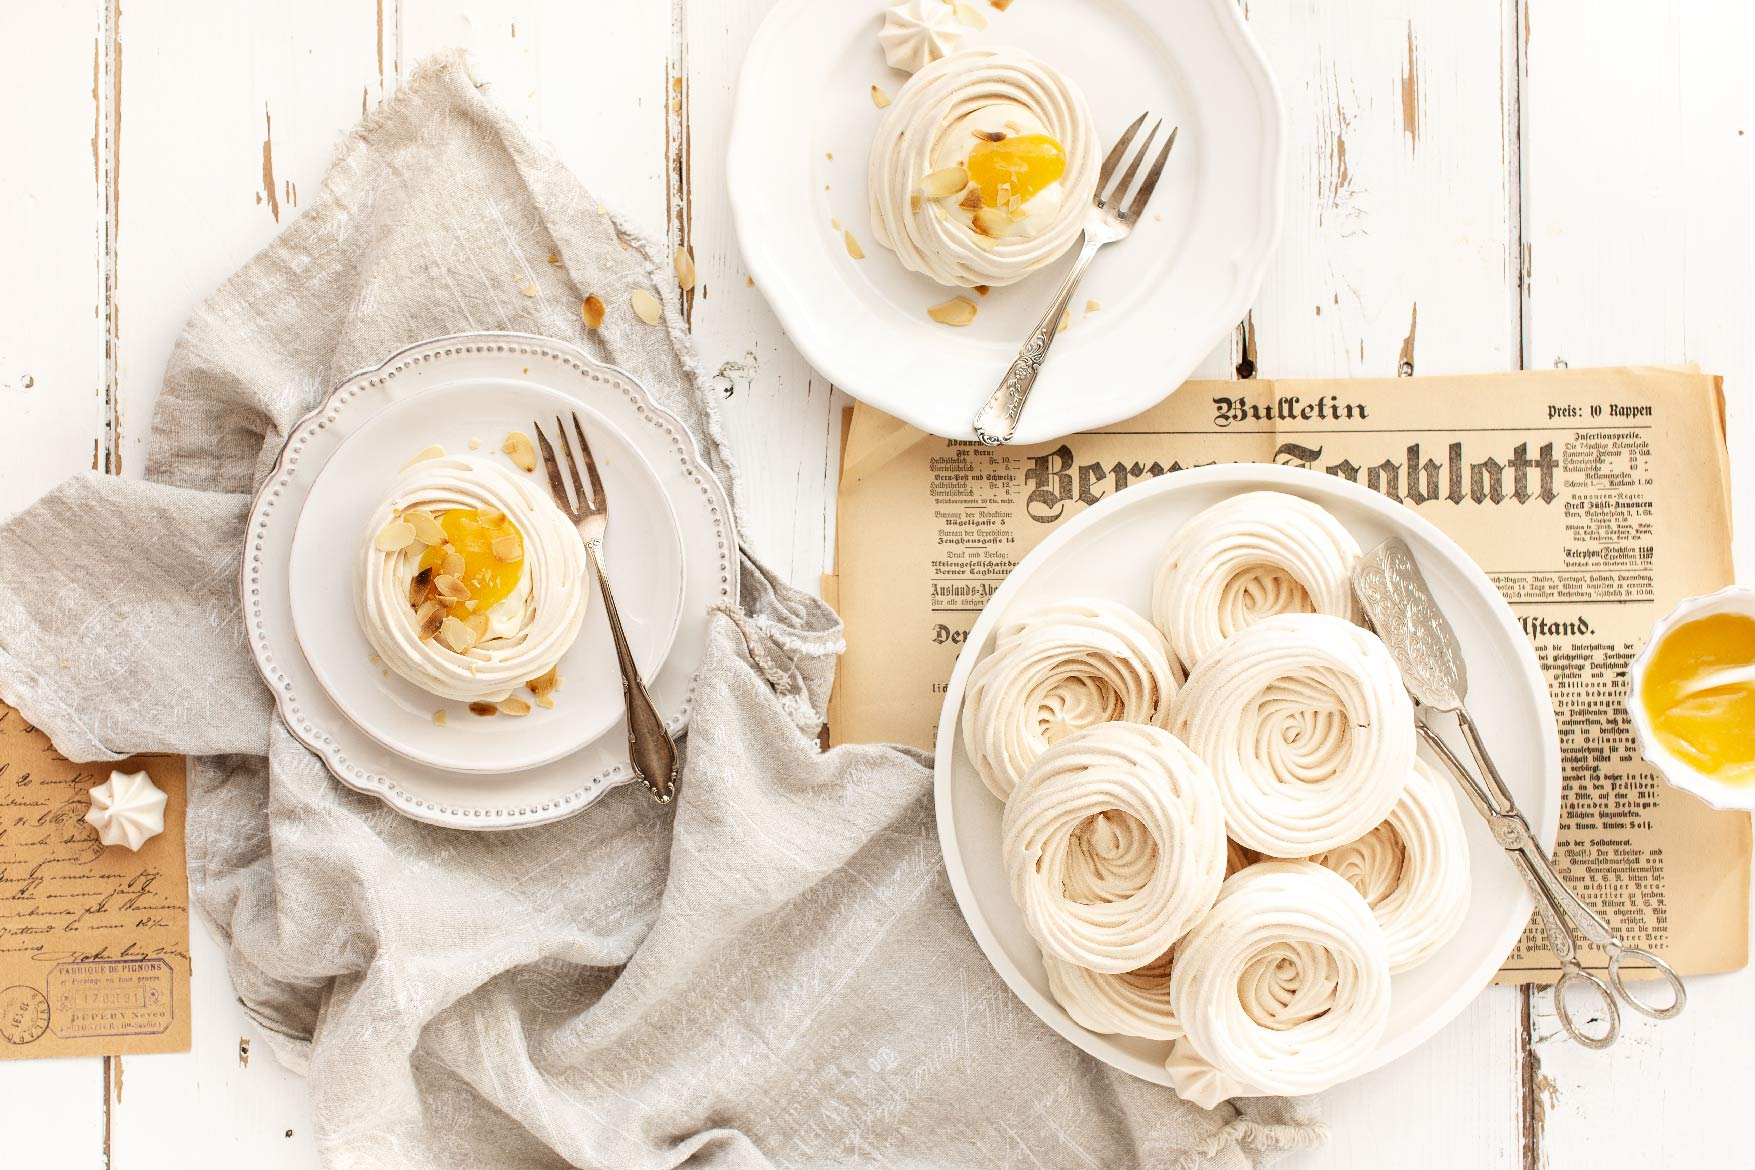 osterdessert, baisernester, minipavlova, dessert zu ostern, ostern, backen, meringues, lemoncurd, baisers, osterzeit, emmeküche